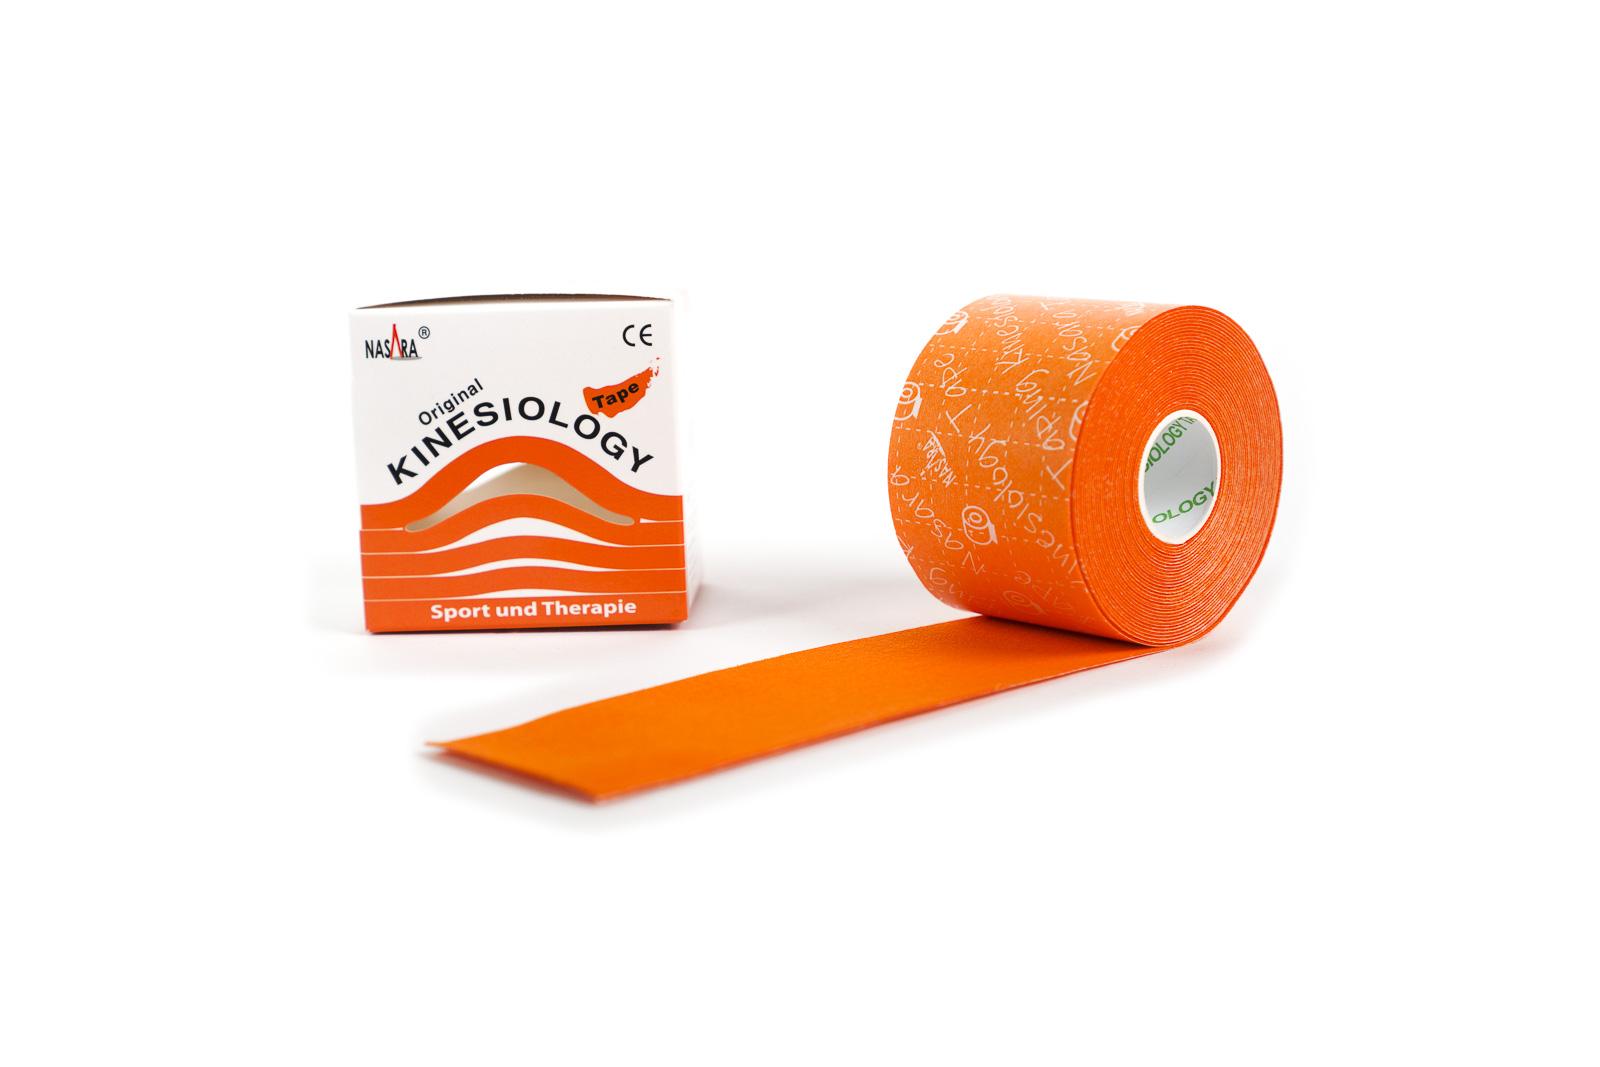 Nasara Kinesiology Tape 5cm x 5m Orange